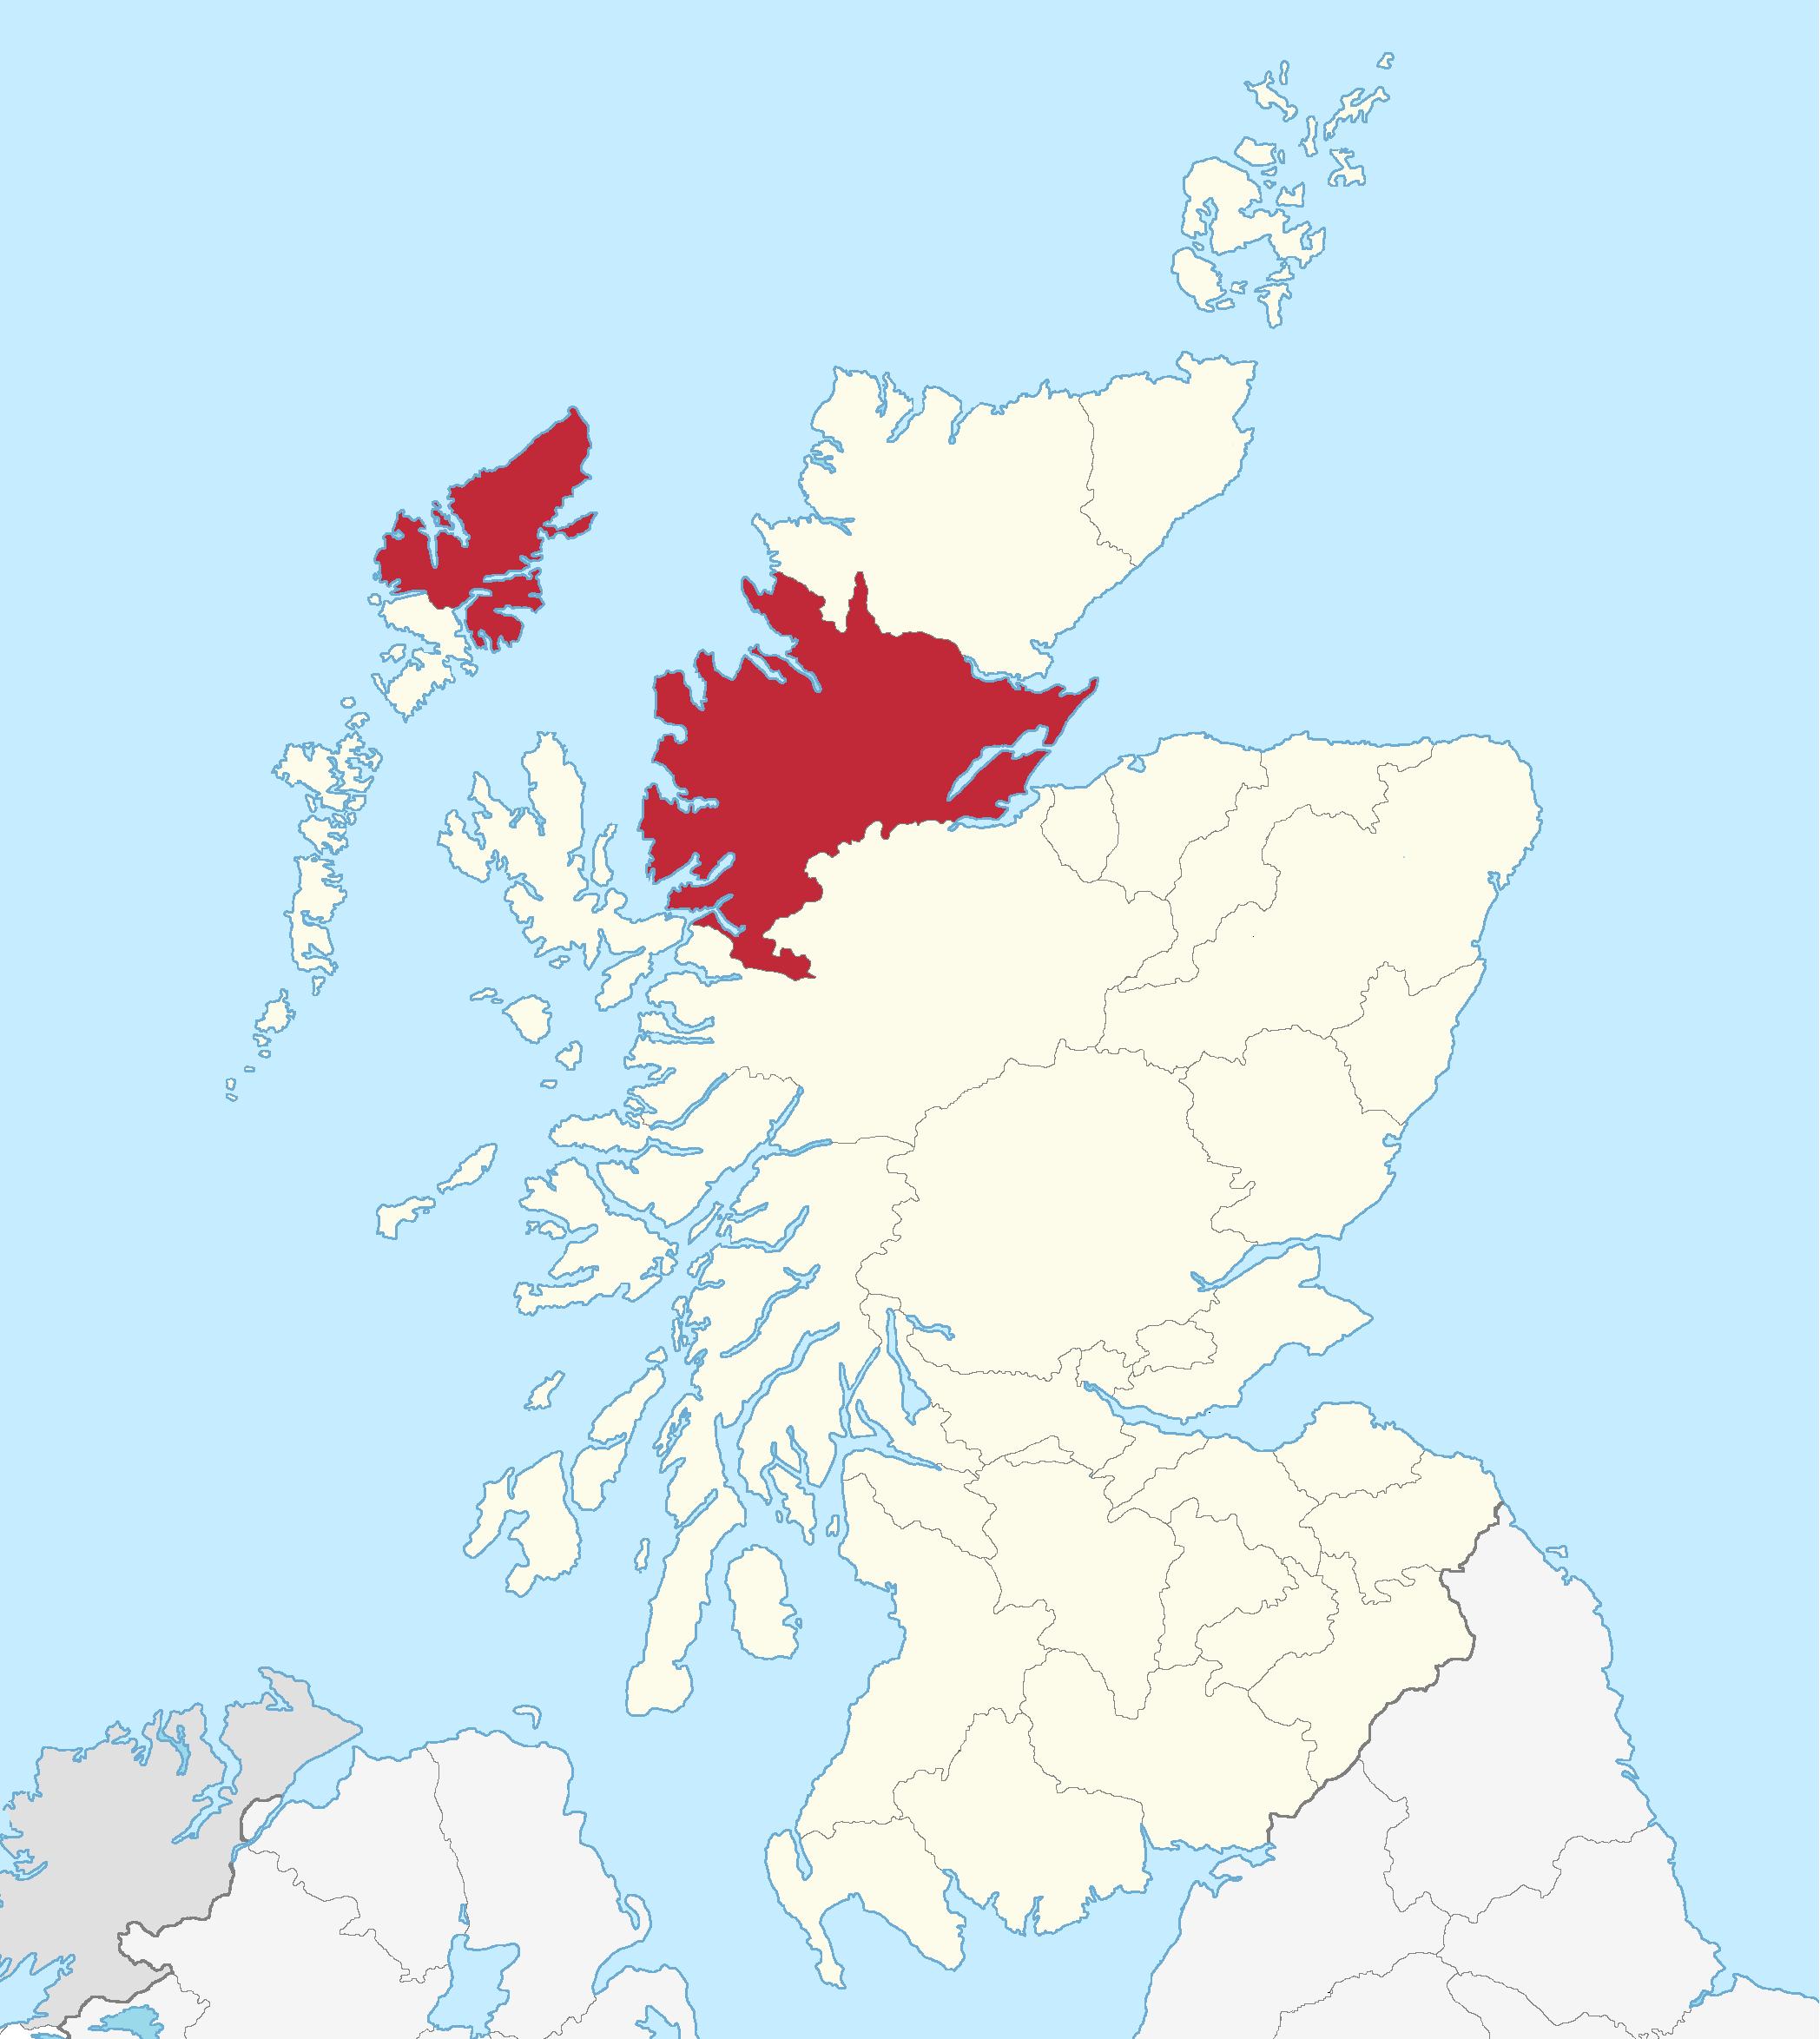 ScotlandRossCromarty